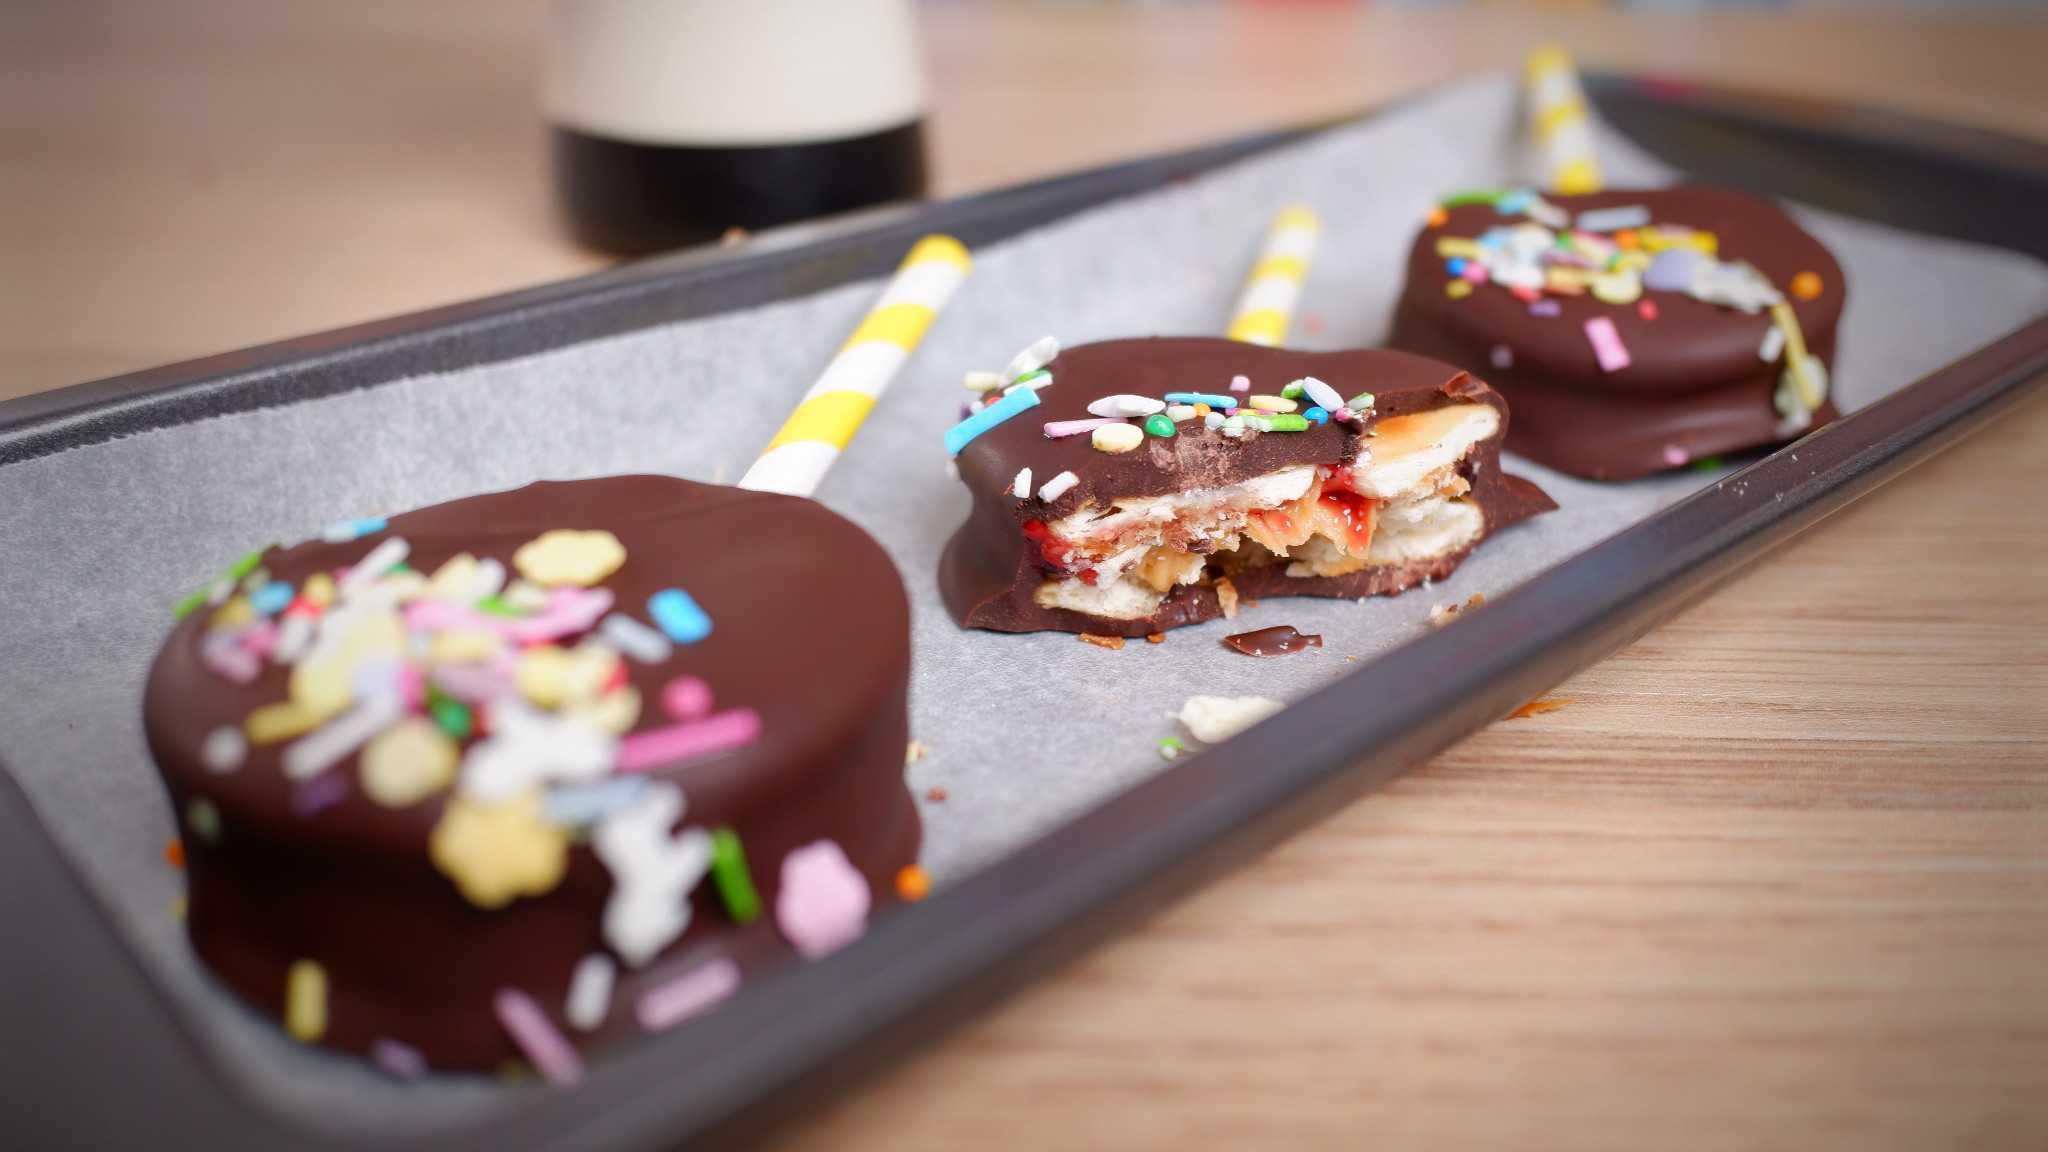 9Honey Every Day Kitchen: This is the cheekiest peanut butter jam and chocolate Jatz hack yet